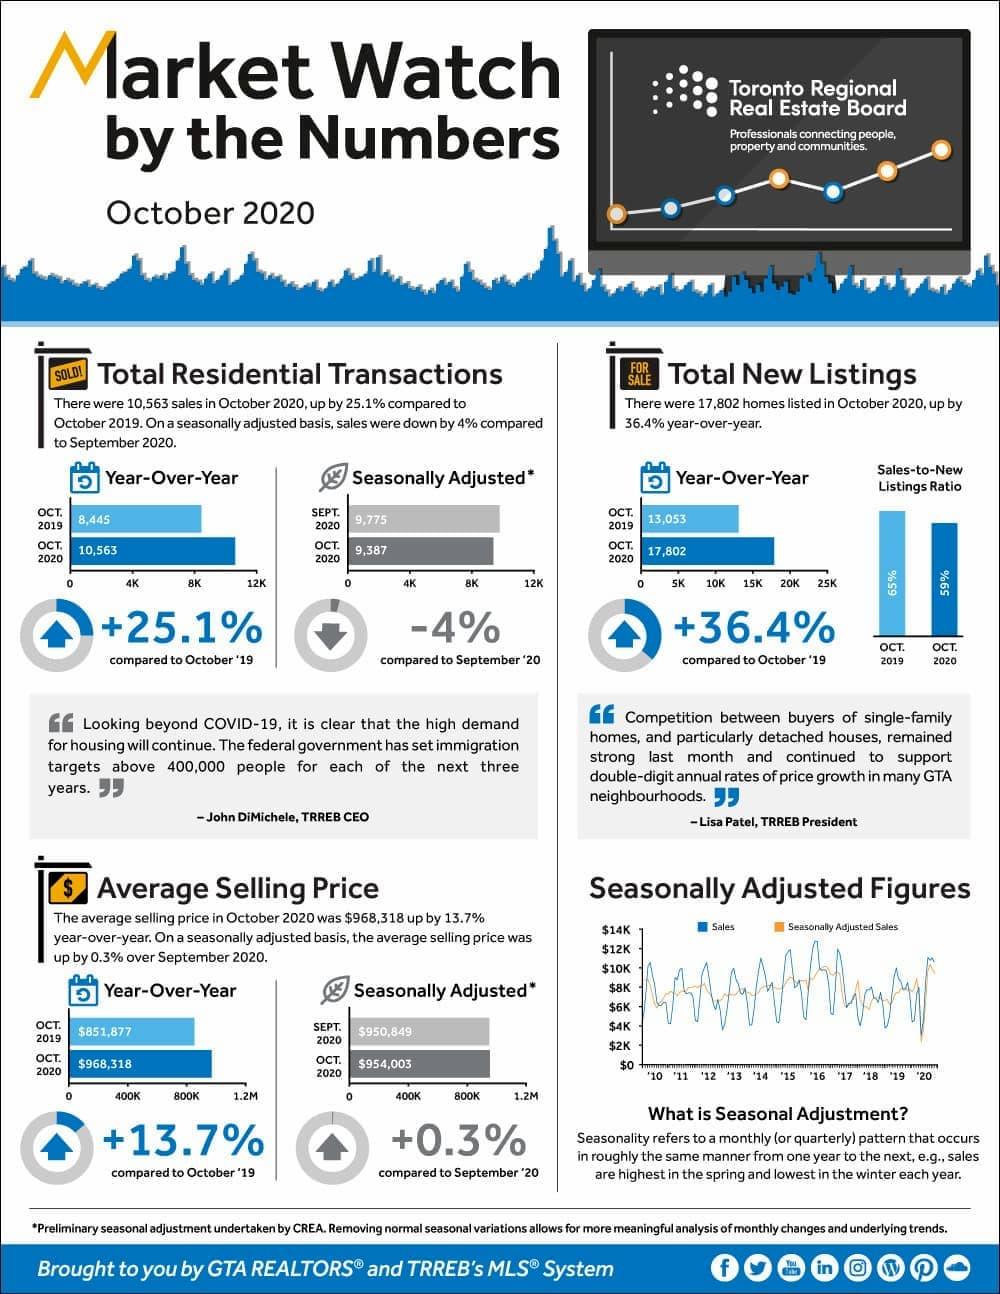 MarketWatch_infographic_October2020.jpg